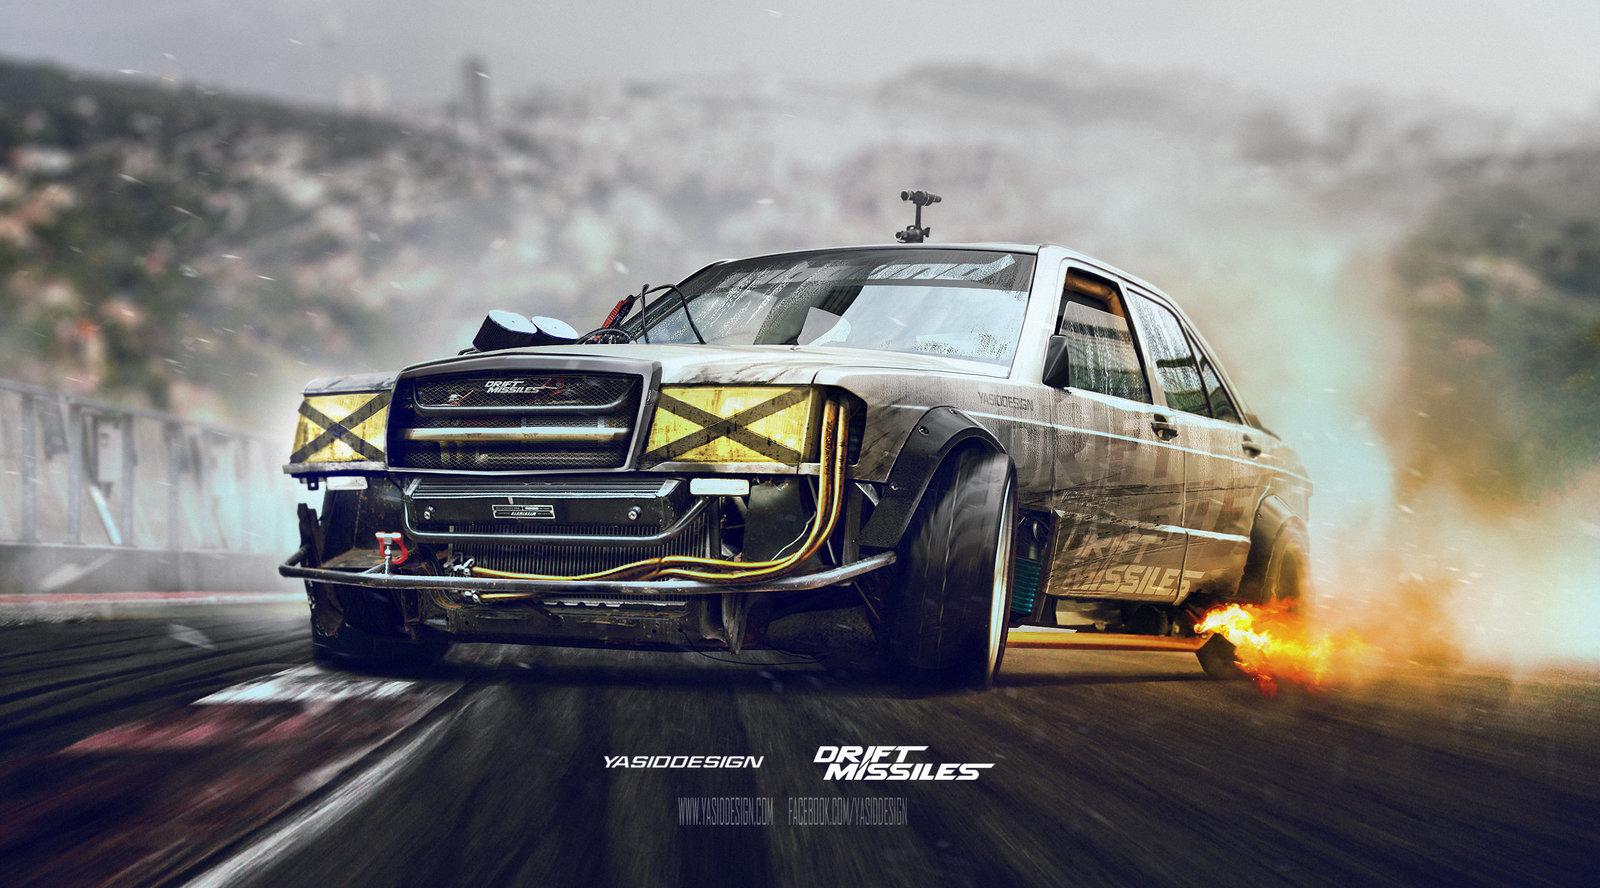 Drift missile Mercedes w201